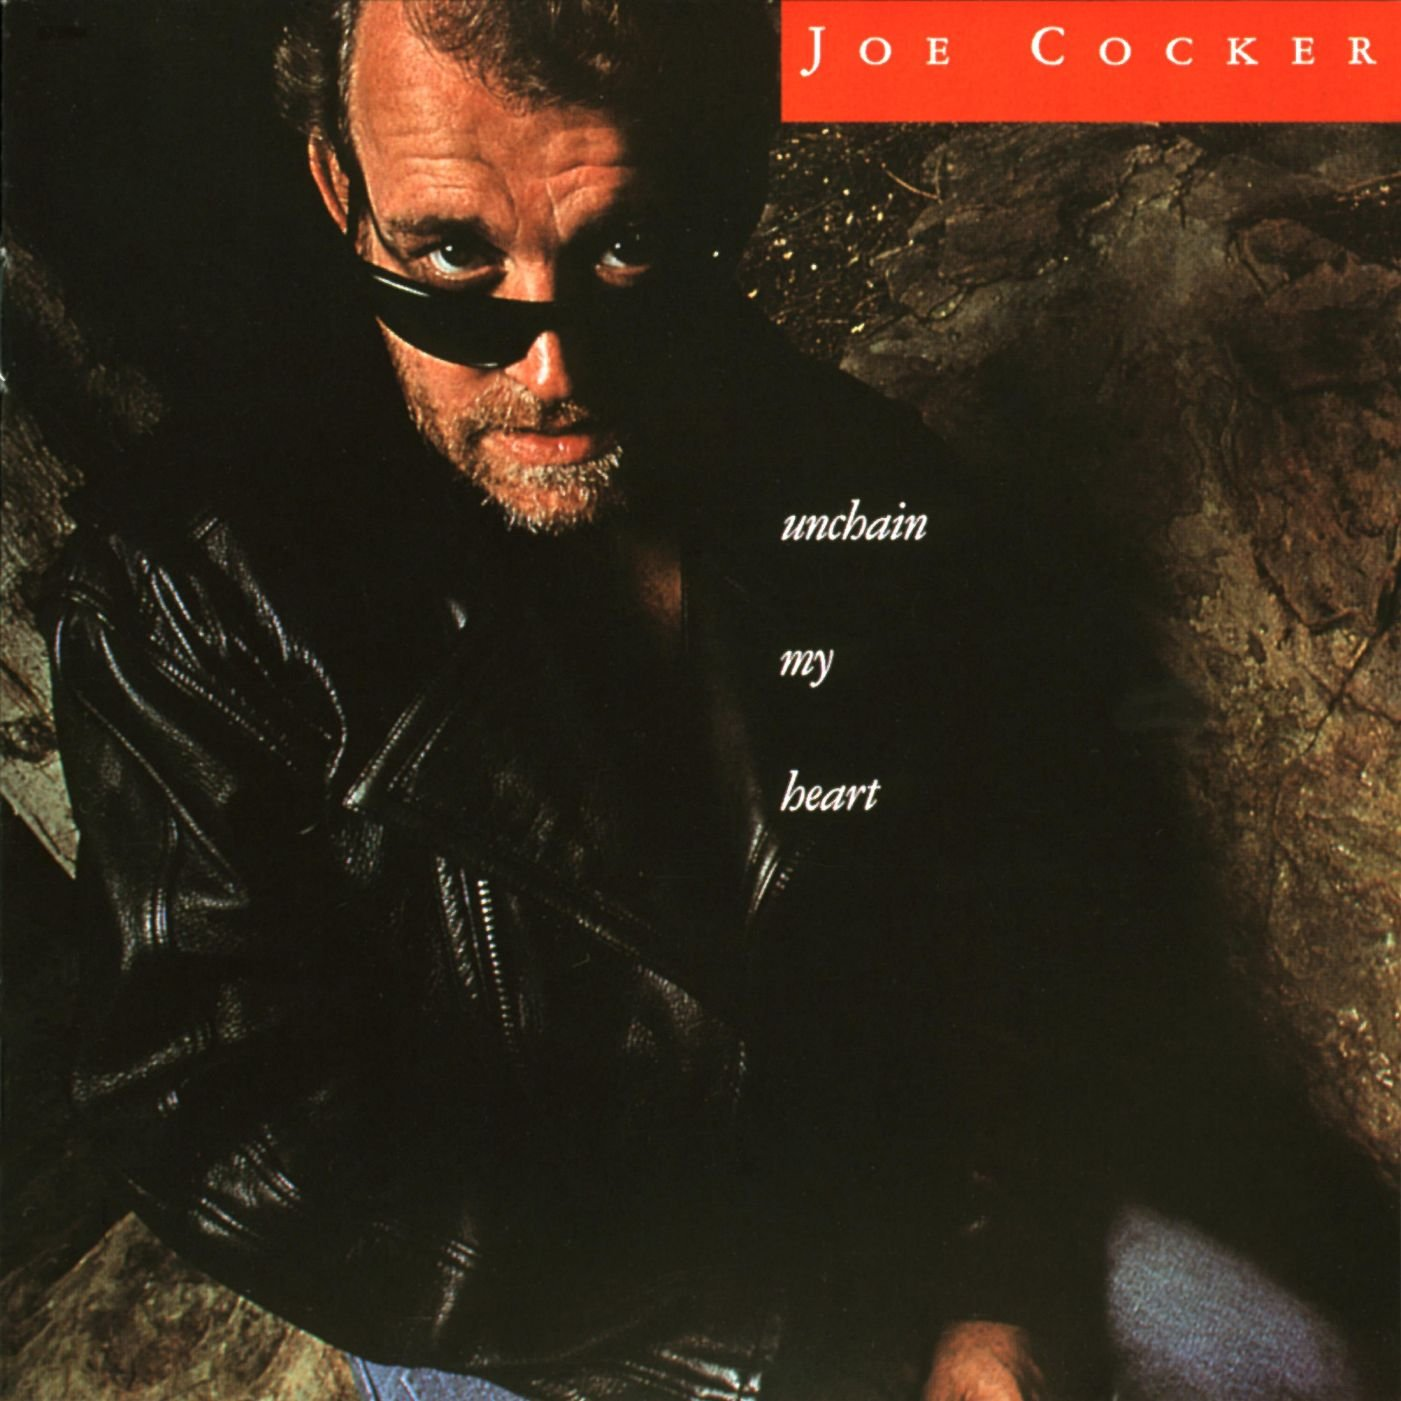 Joe Cocker - CD Unchain My Heart